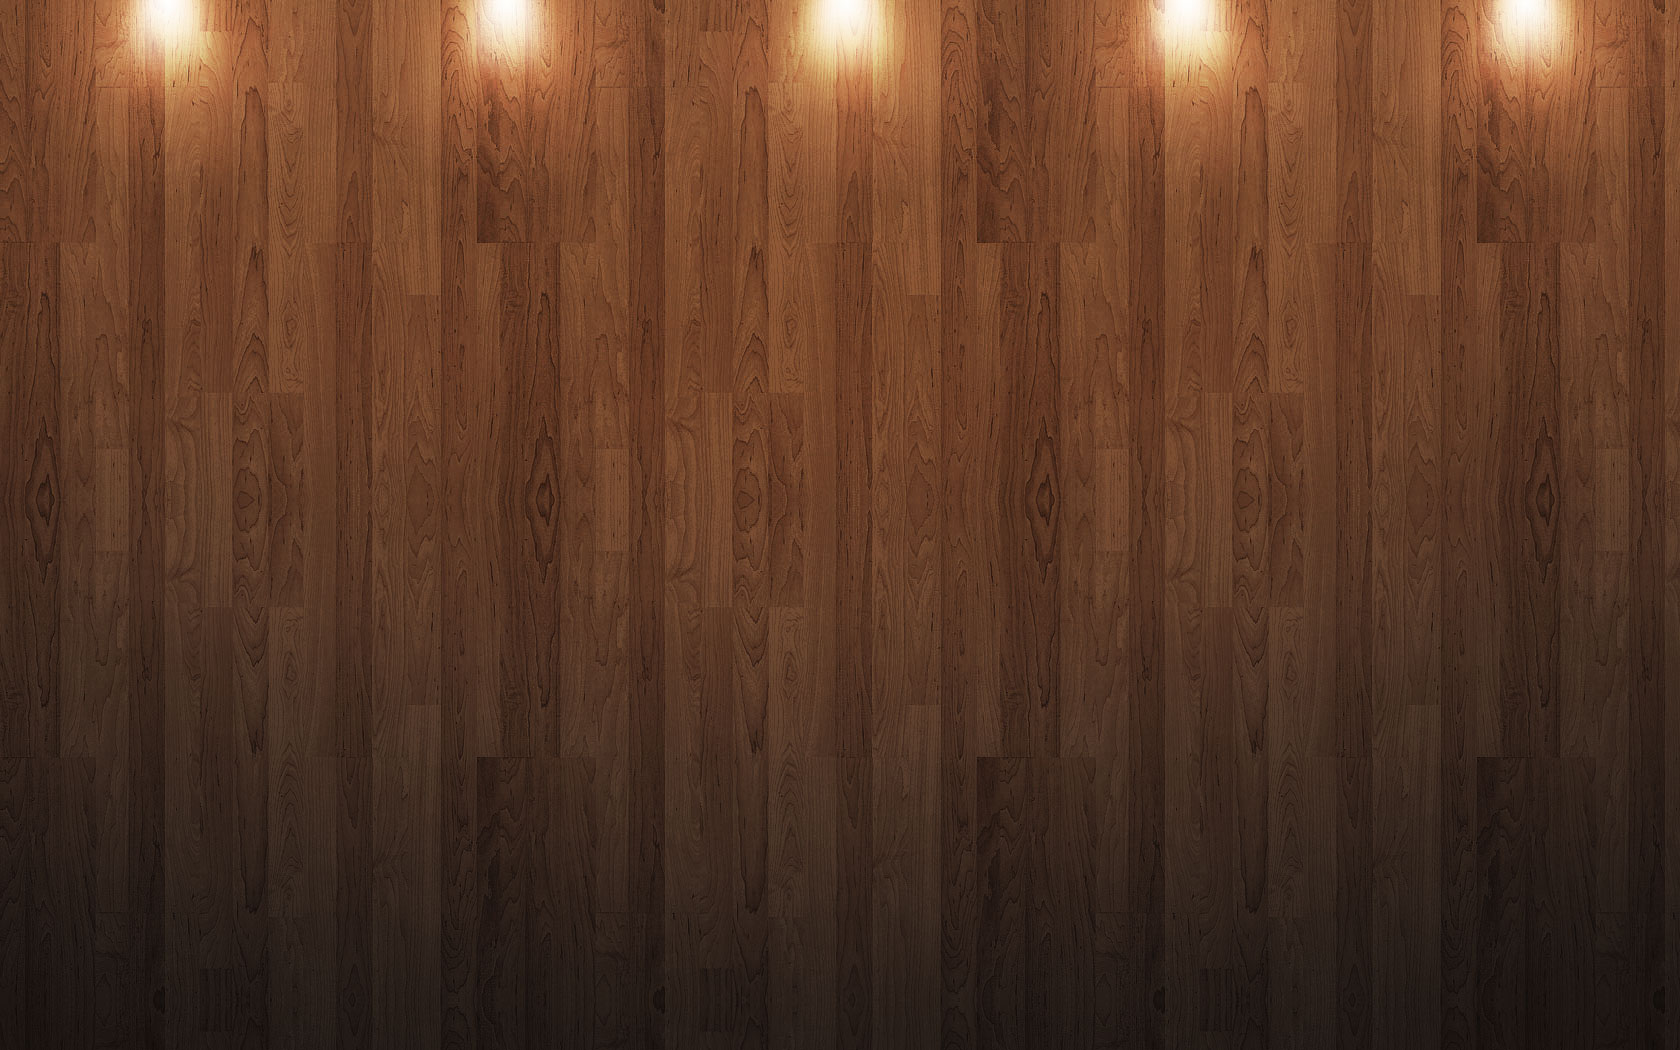 Top Wallpaper Home Screen Wood - tumblr_static_hardwood_with_lights  Image_274025.jpg